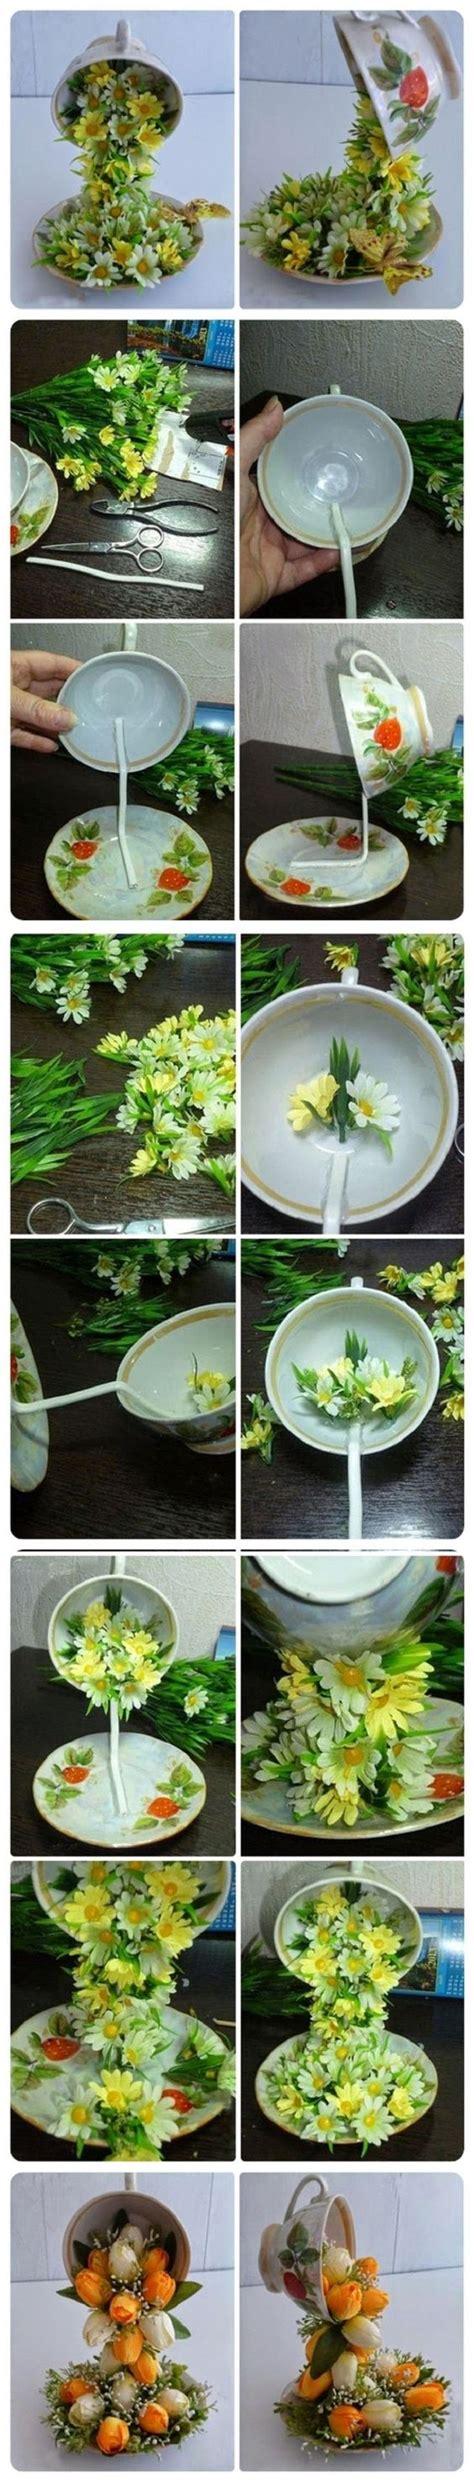 diy beautiful flying flower arrangements beautiful flower arrangement ideas 2017